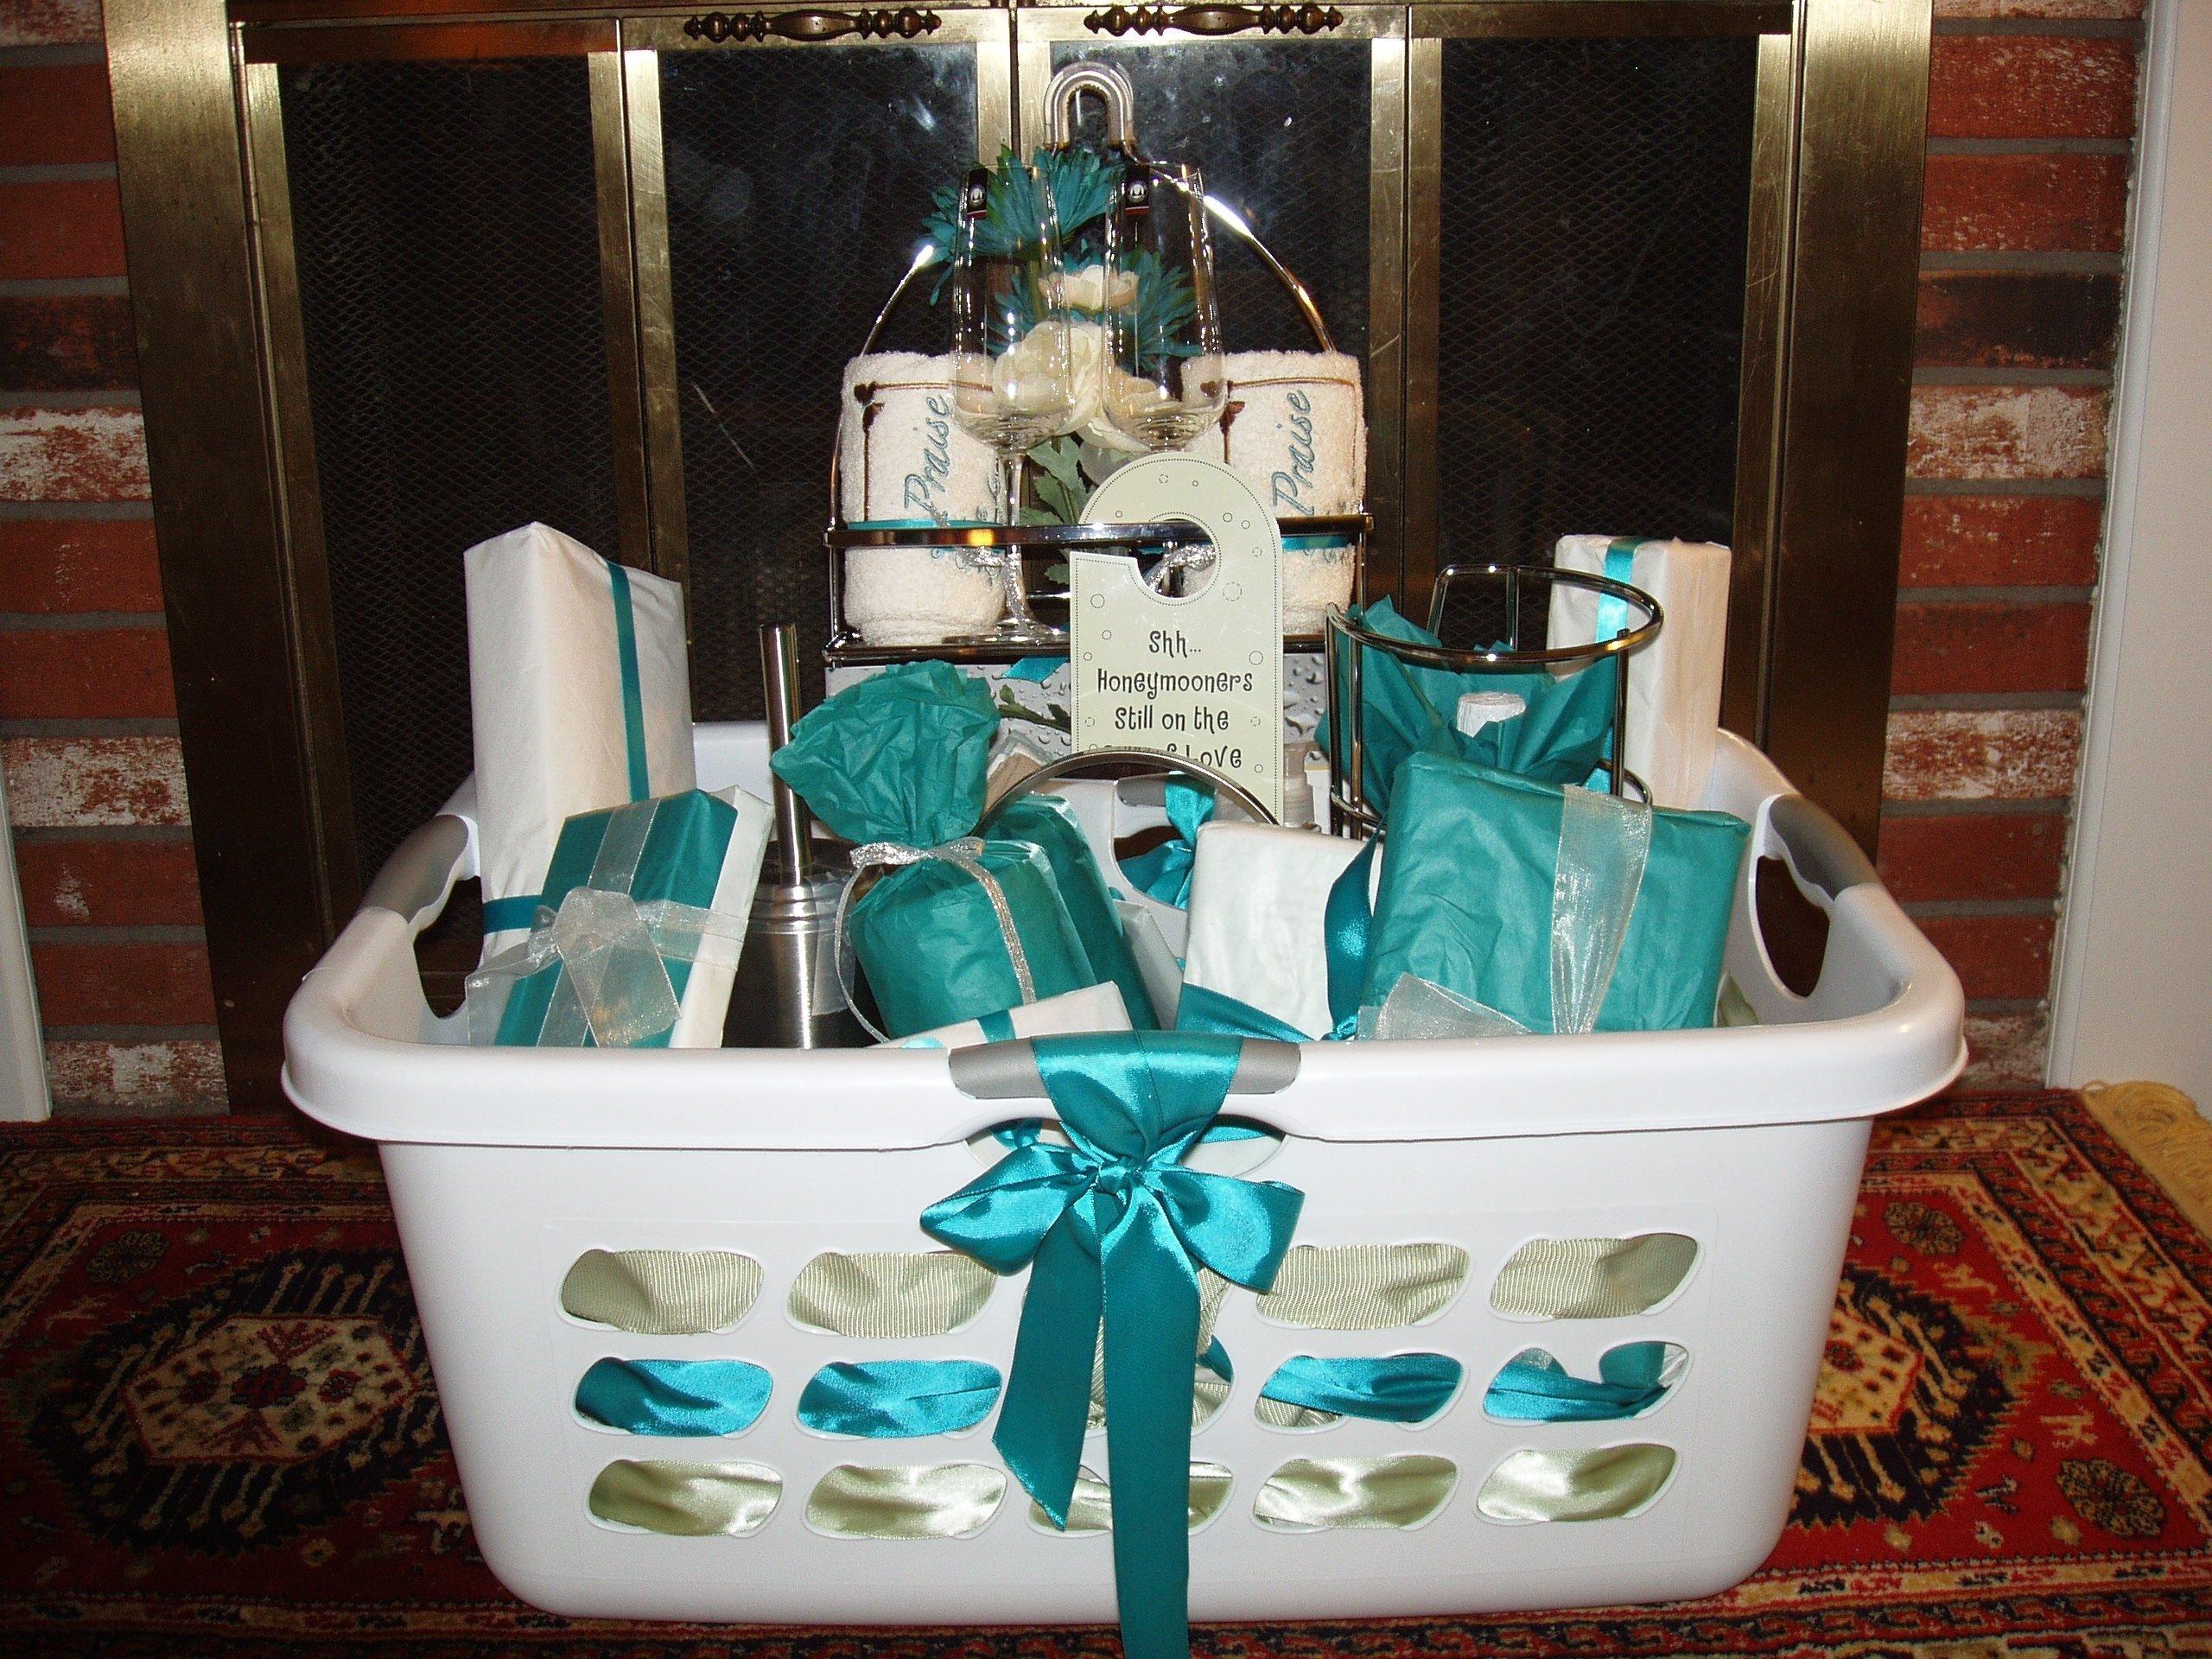 10 Nice Cute Wedding Shower Gift Ideas innovative ideas cute bridal shower gift stylish inspiration basket 2020